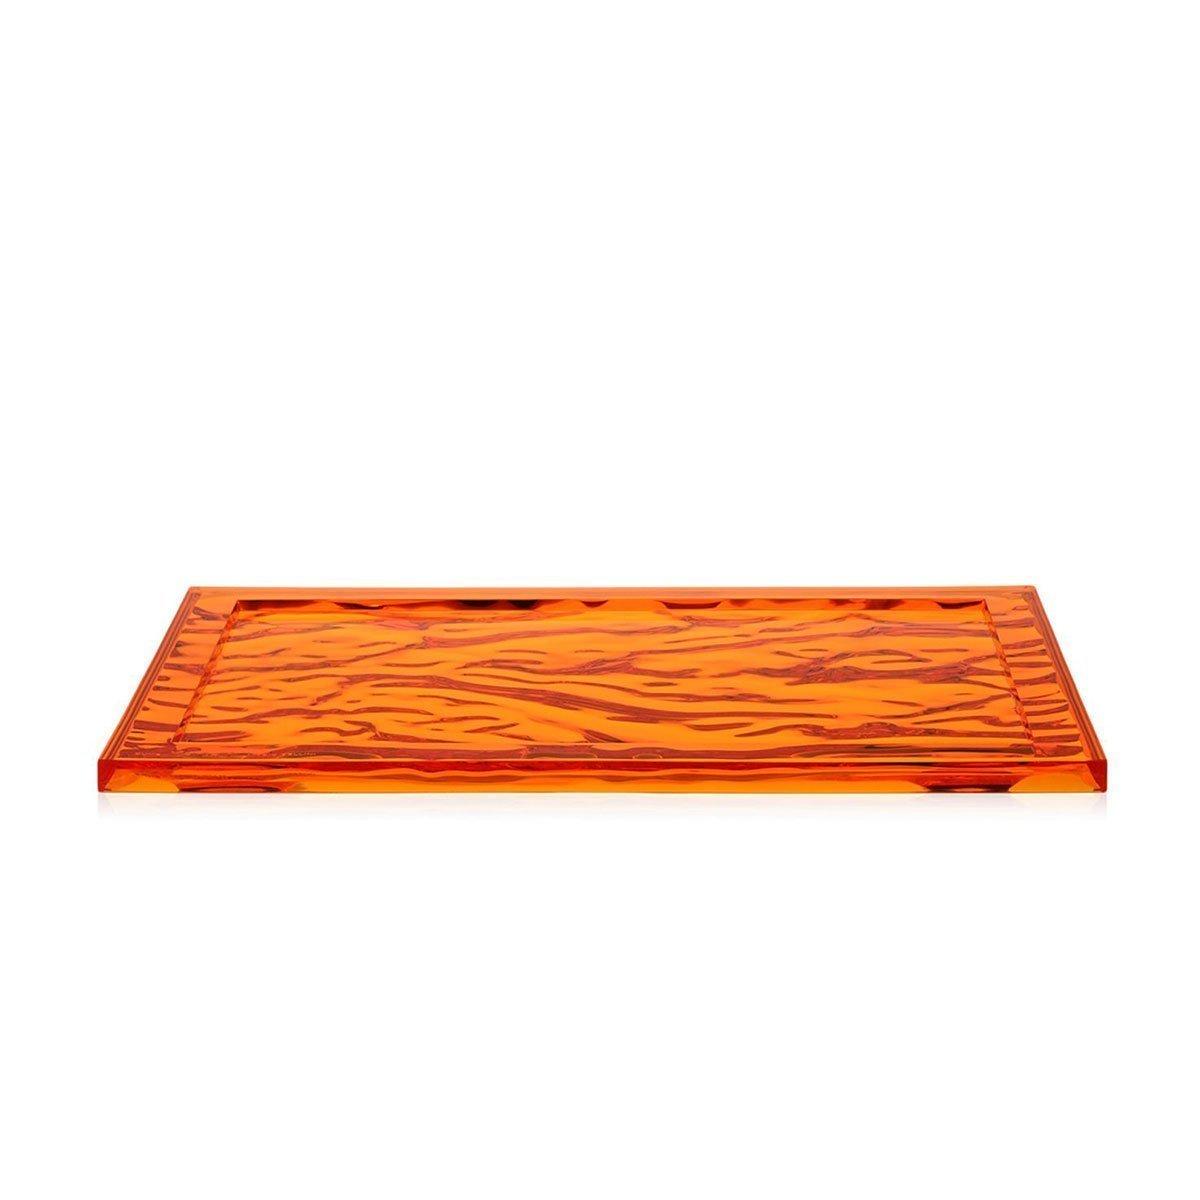 Kartell Dune Dienblad - Klein - Oranje